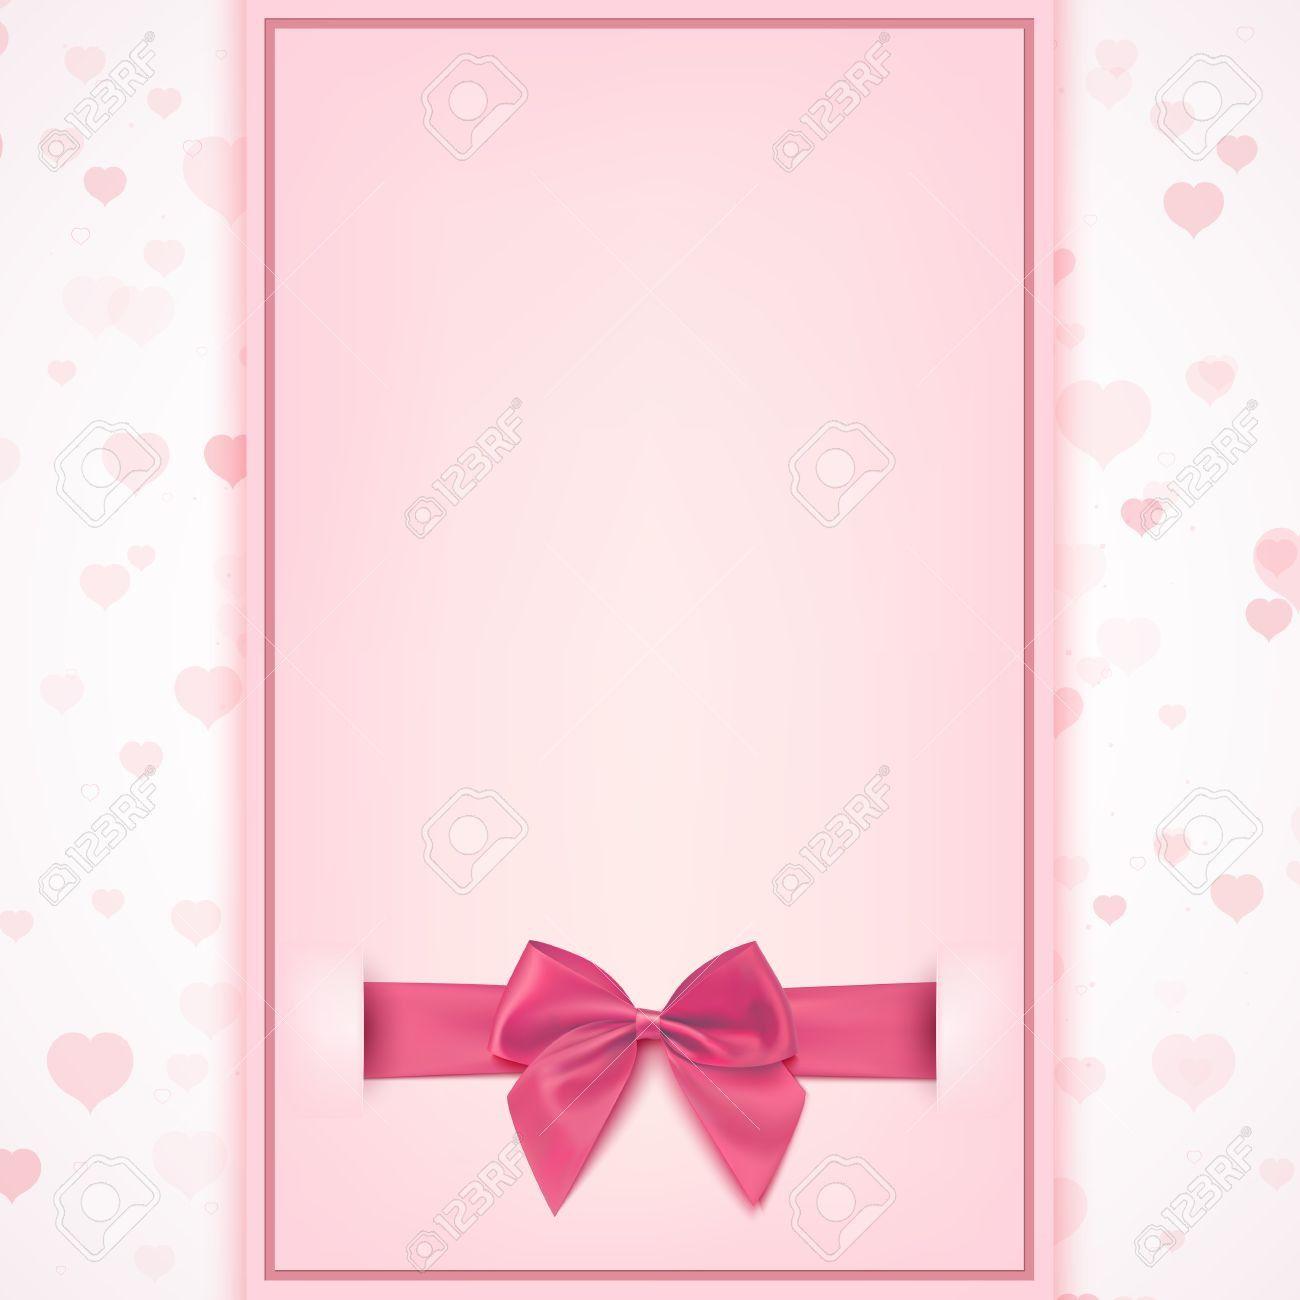 004 Sensational Blank Birthday Card Template Sample  Word Free Printable Greeting DownloadFull